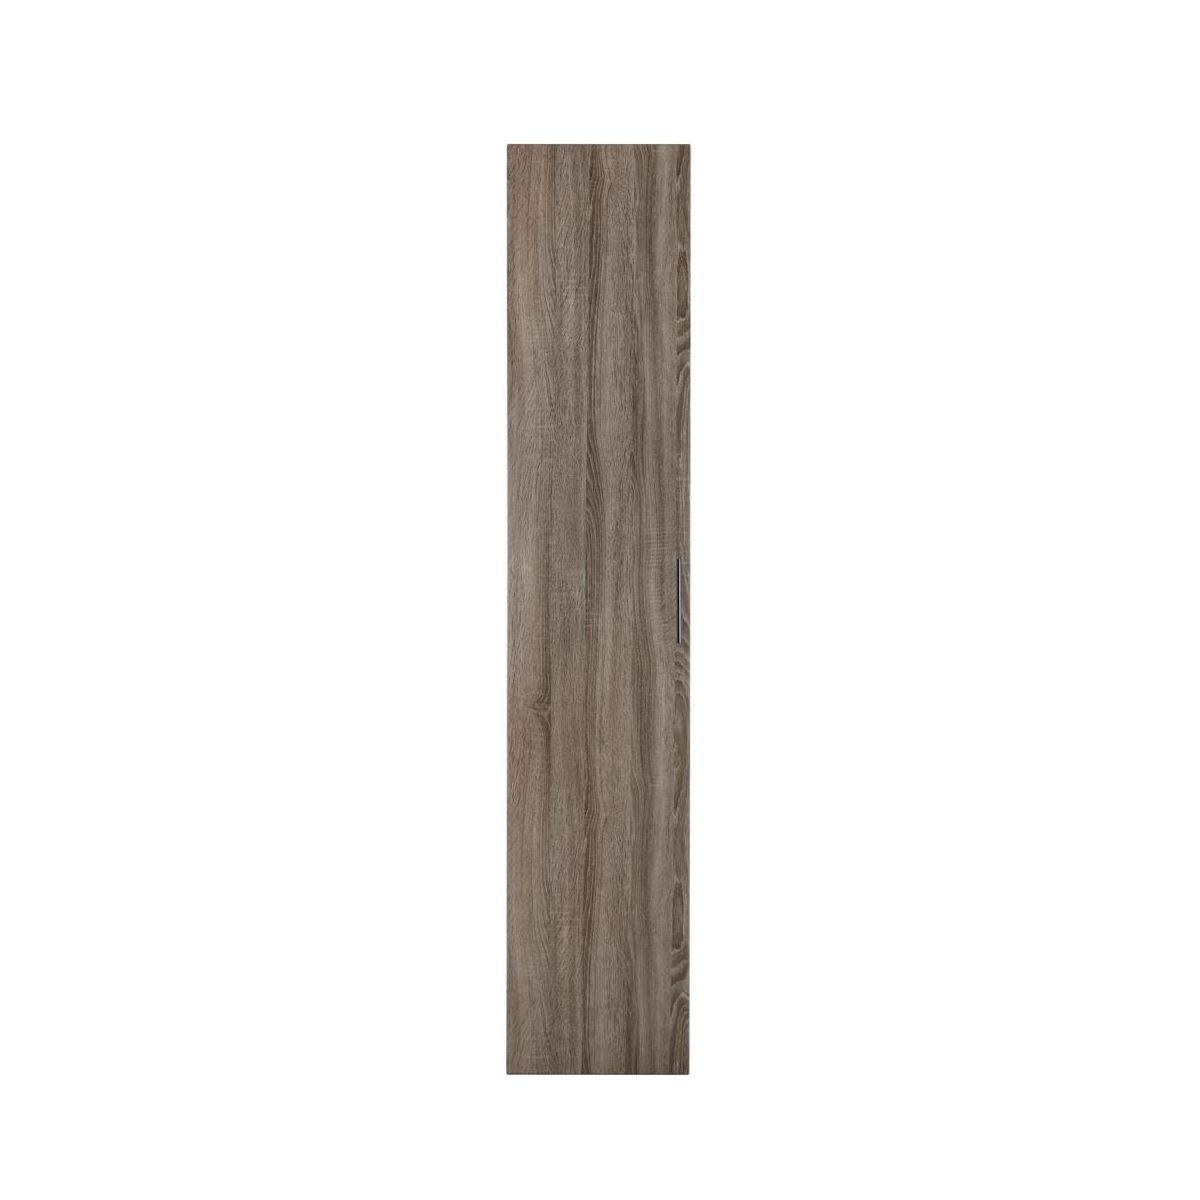 front f40 200 arles 39 7 cm x 200 1 cm delinia sprawd. Black Bedroom Furniture Sets. Home Design Ideas